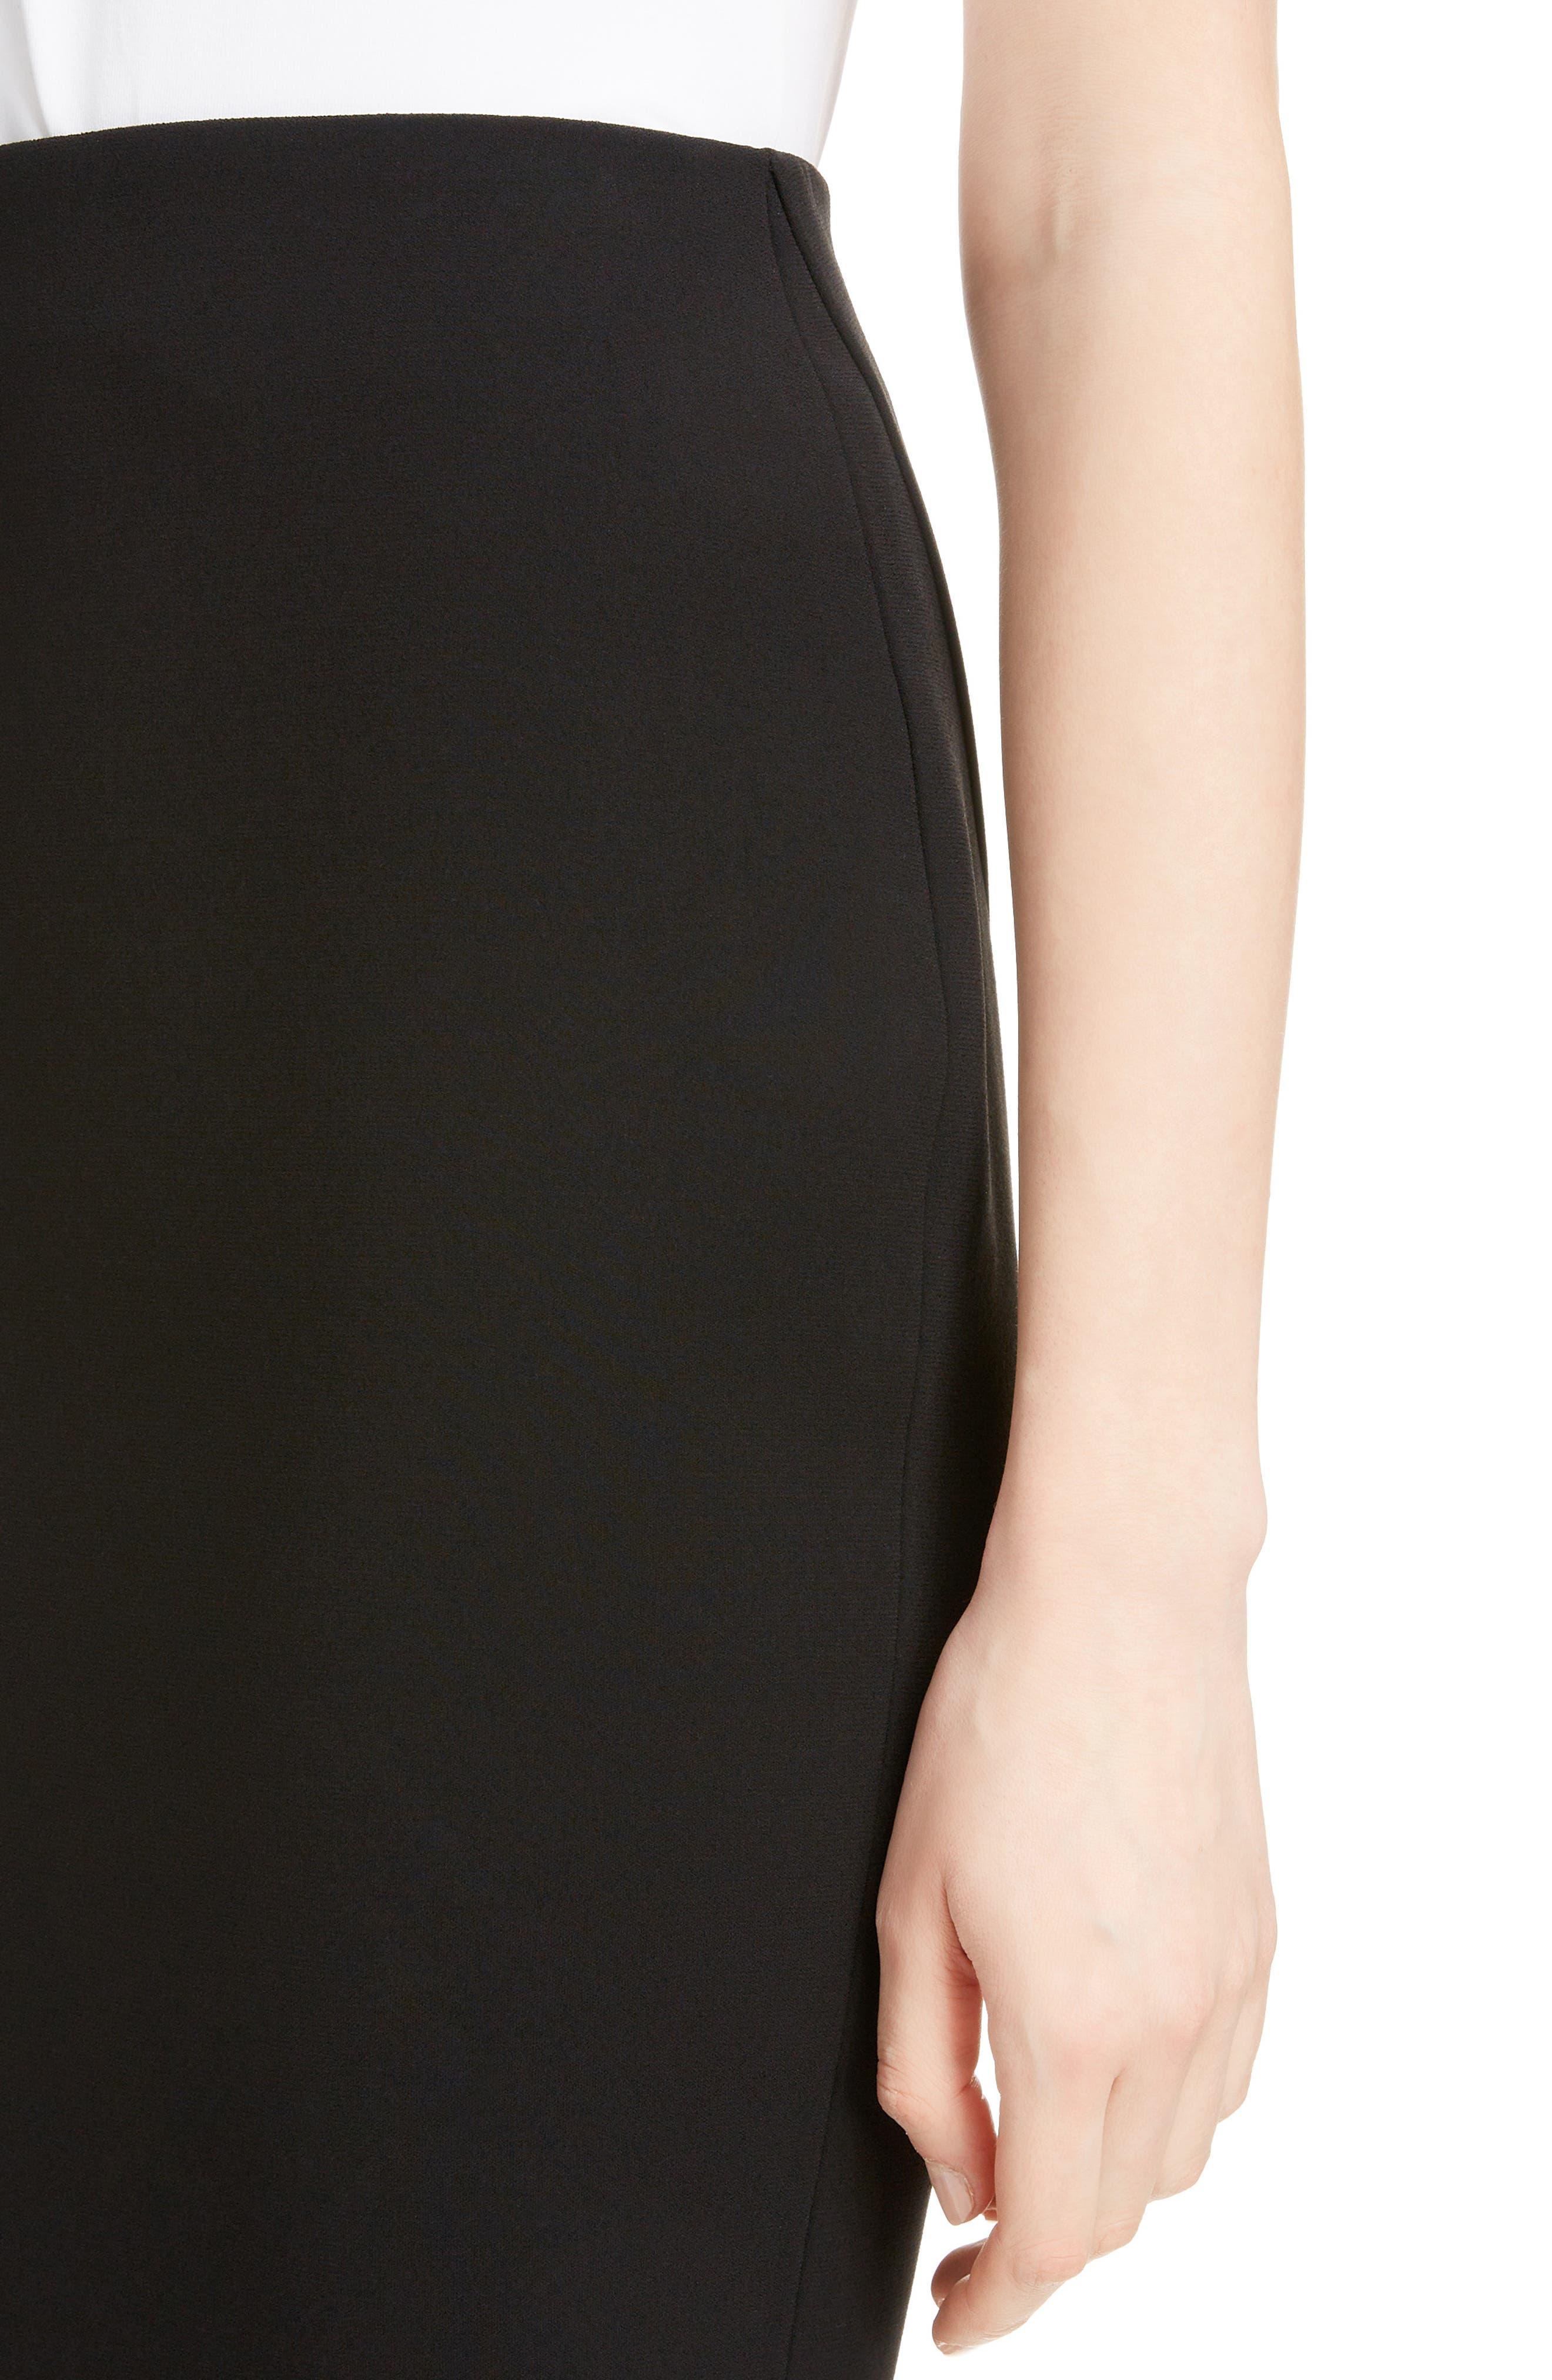 VICTORIA BECKHAM, Back Zip Pencil Skirt, Alternate thumbnail 4, color, BLACK